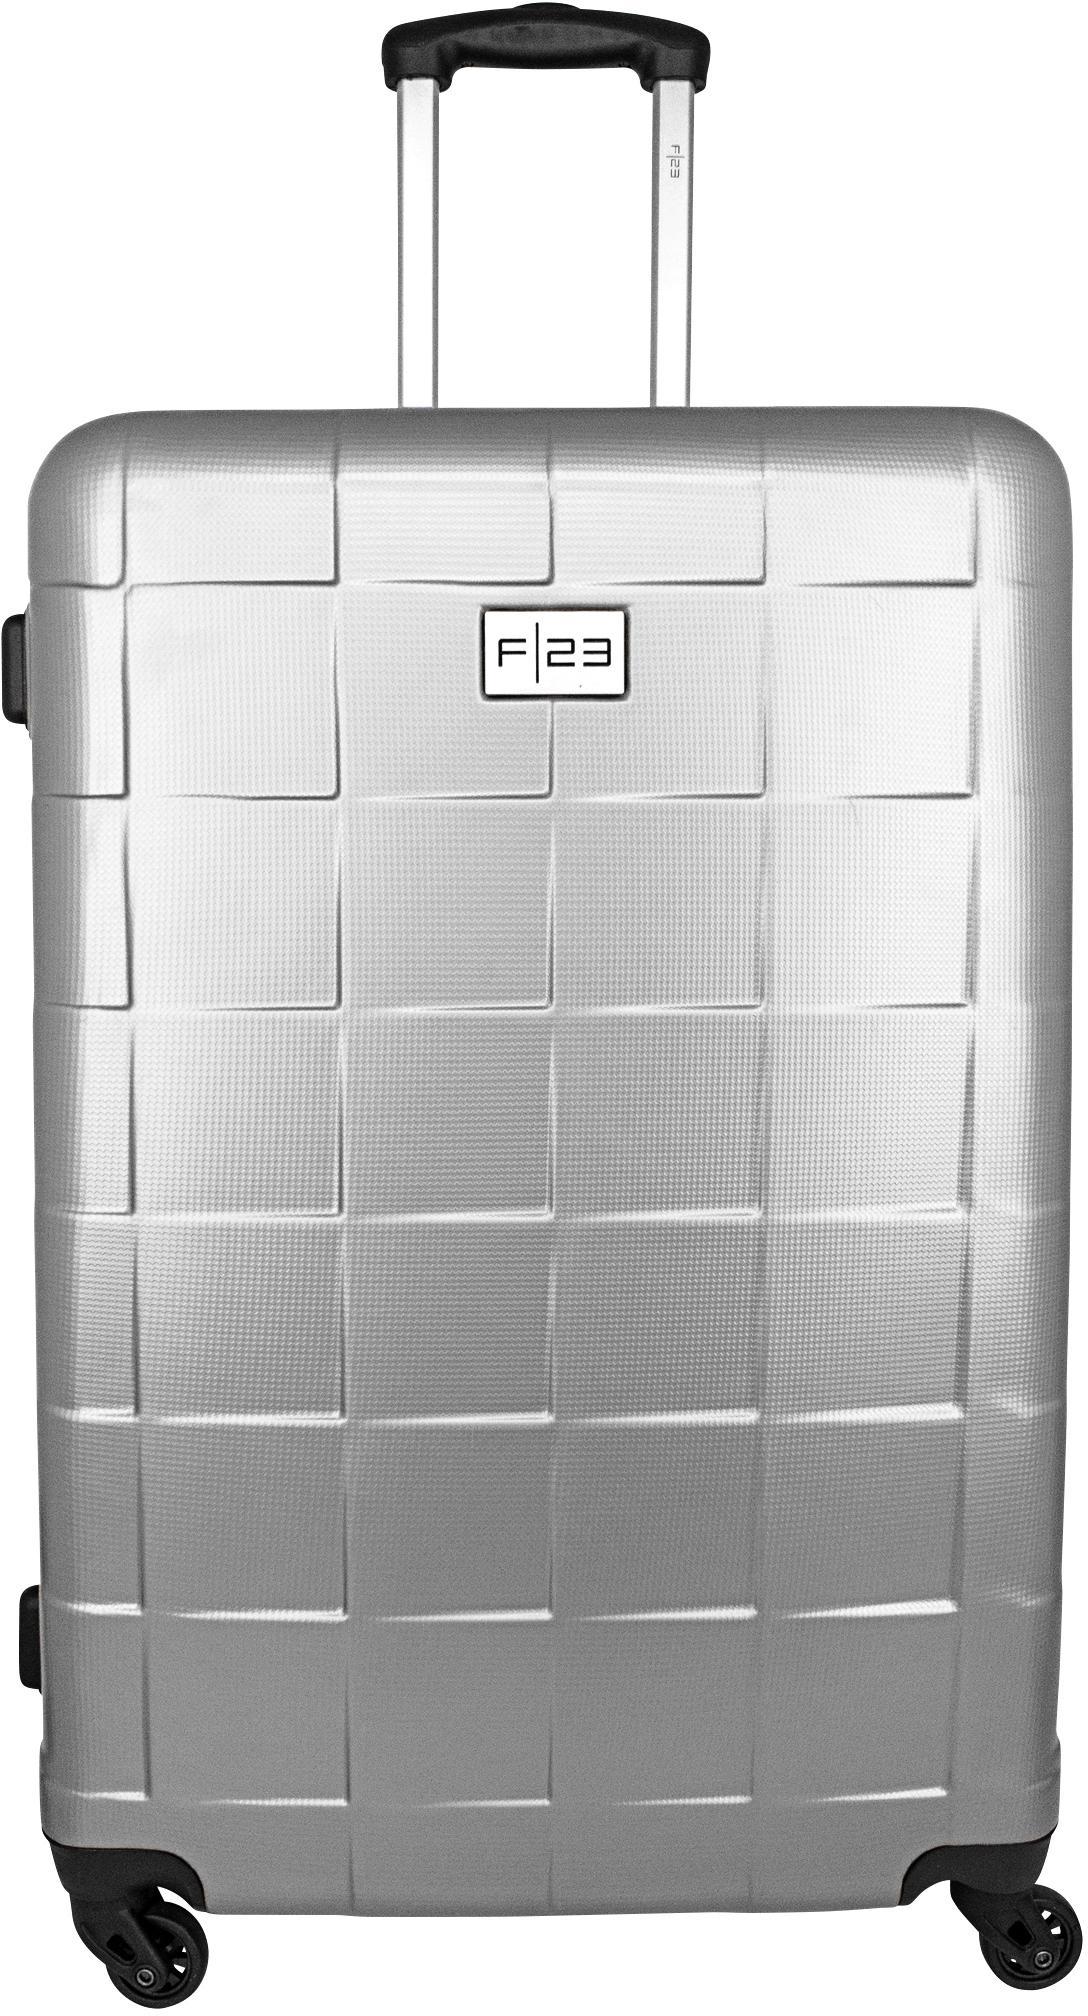 F23™ Hartschalen-Trolley Wave 3.0, 78 cm, silberfarben, 4 Rollen   Taschen > Koffer & Trolleys > Trolleys   F23